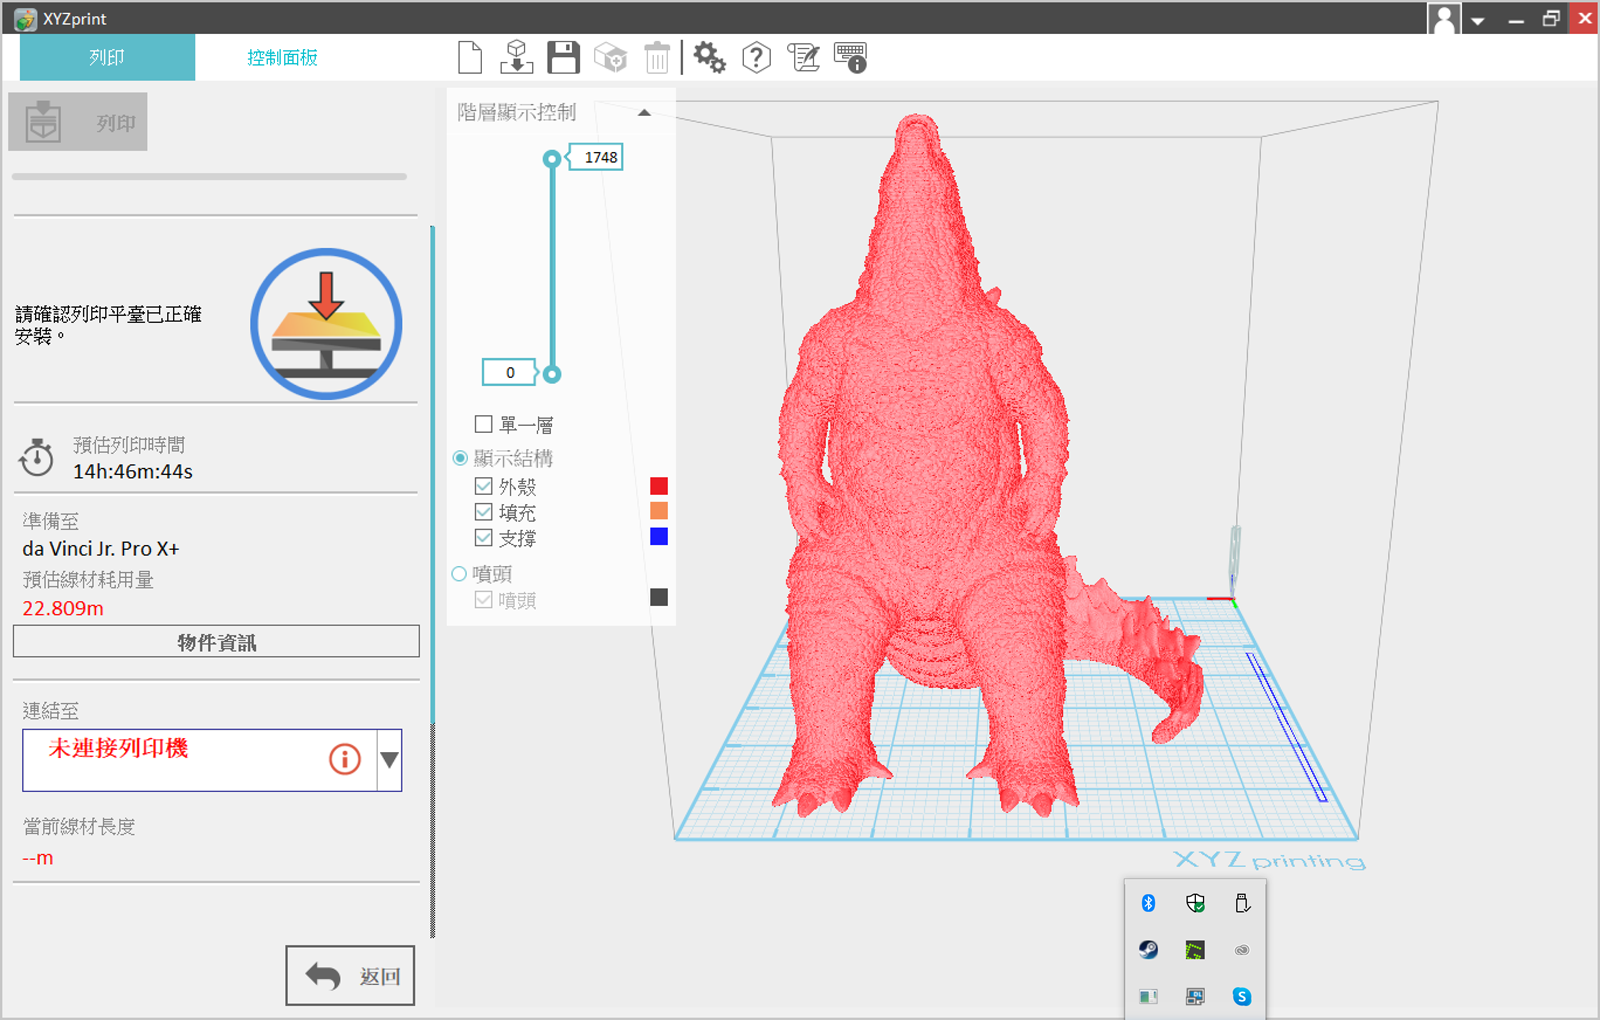 XYZprinting多功能3D列印機-da Vinci Jr. Pro X+,3D模型切片可直接連線或儲存到SD記憶卡離線列印